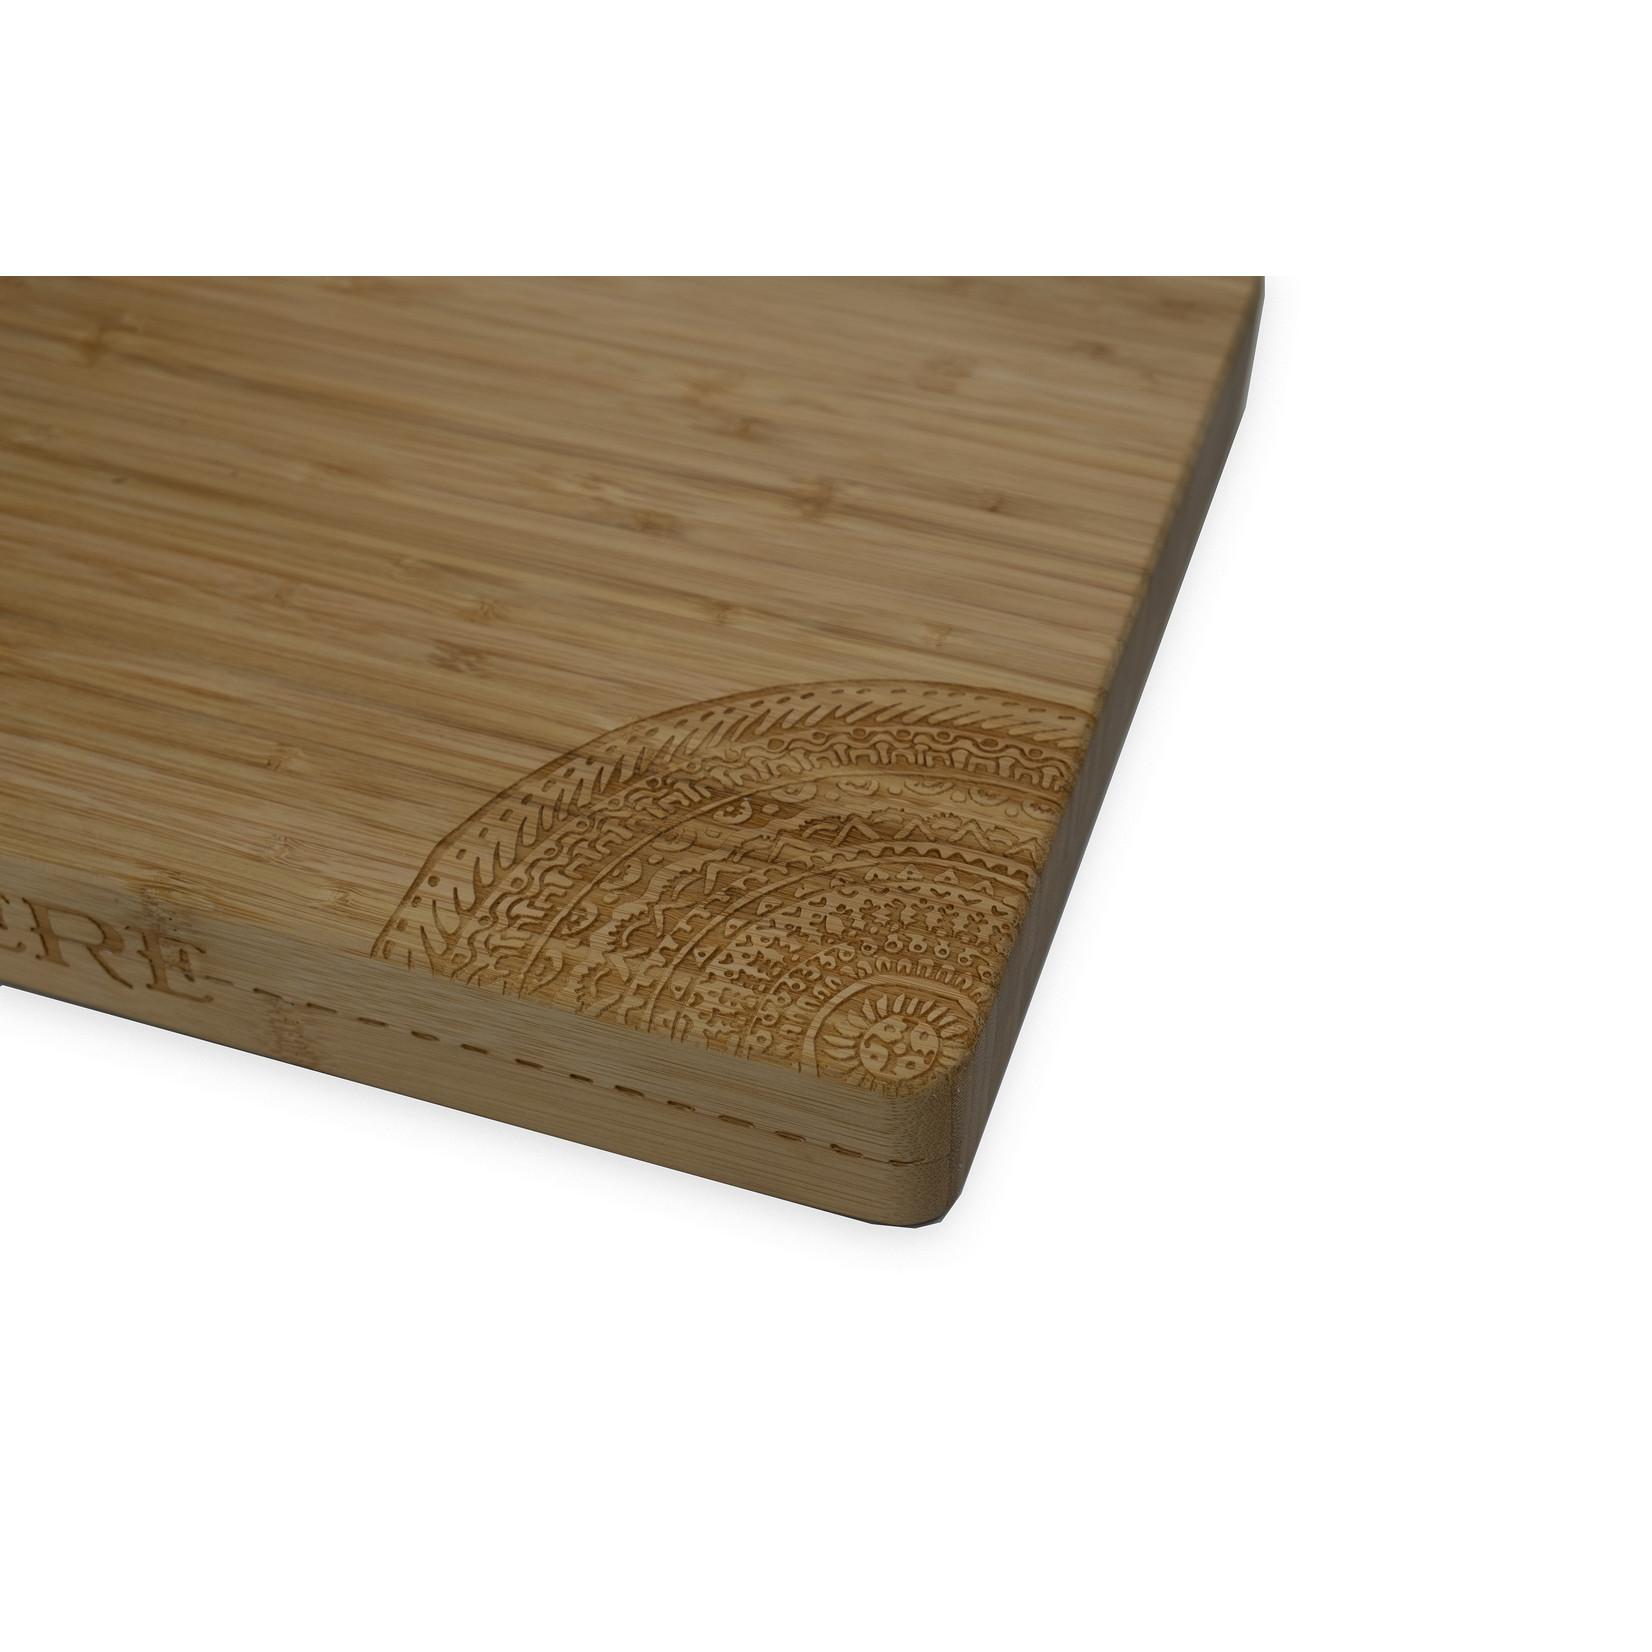 Homeys Homeys Schiffmacher snijplank bamboe, tattoobedrukking